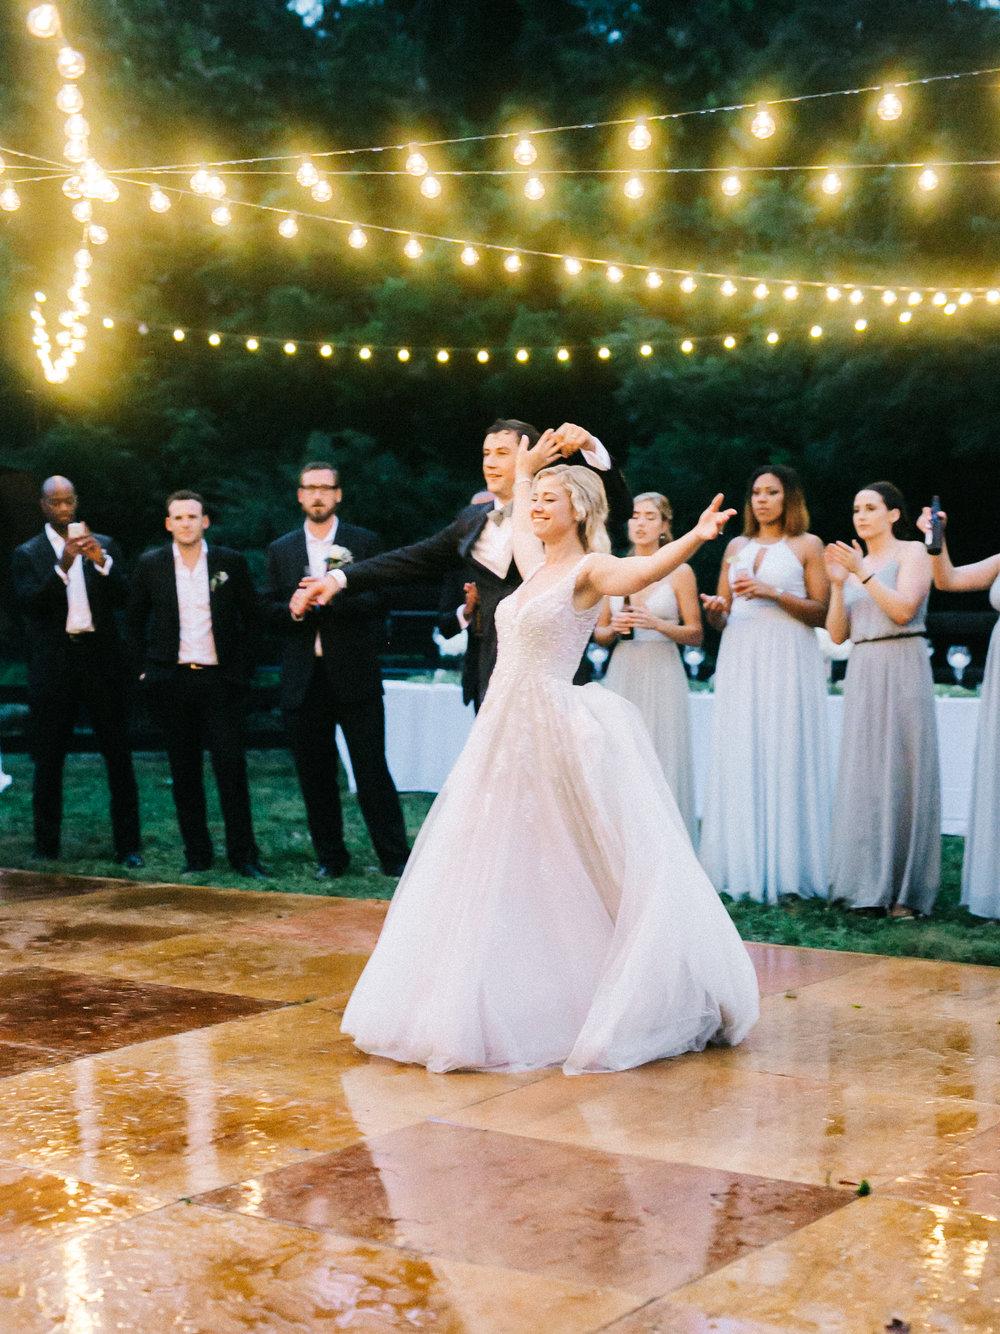 Virginia-Wedding-Photographer-Alex-Keith-94.jpg